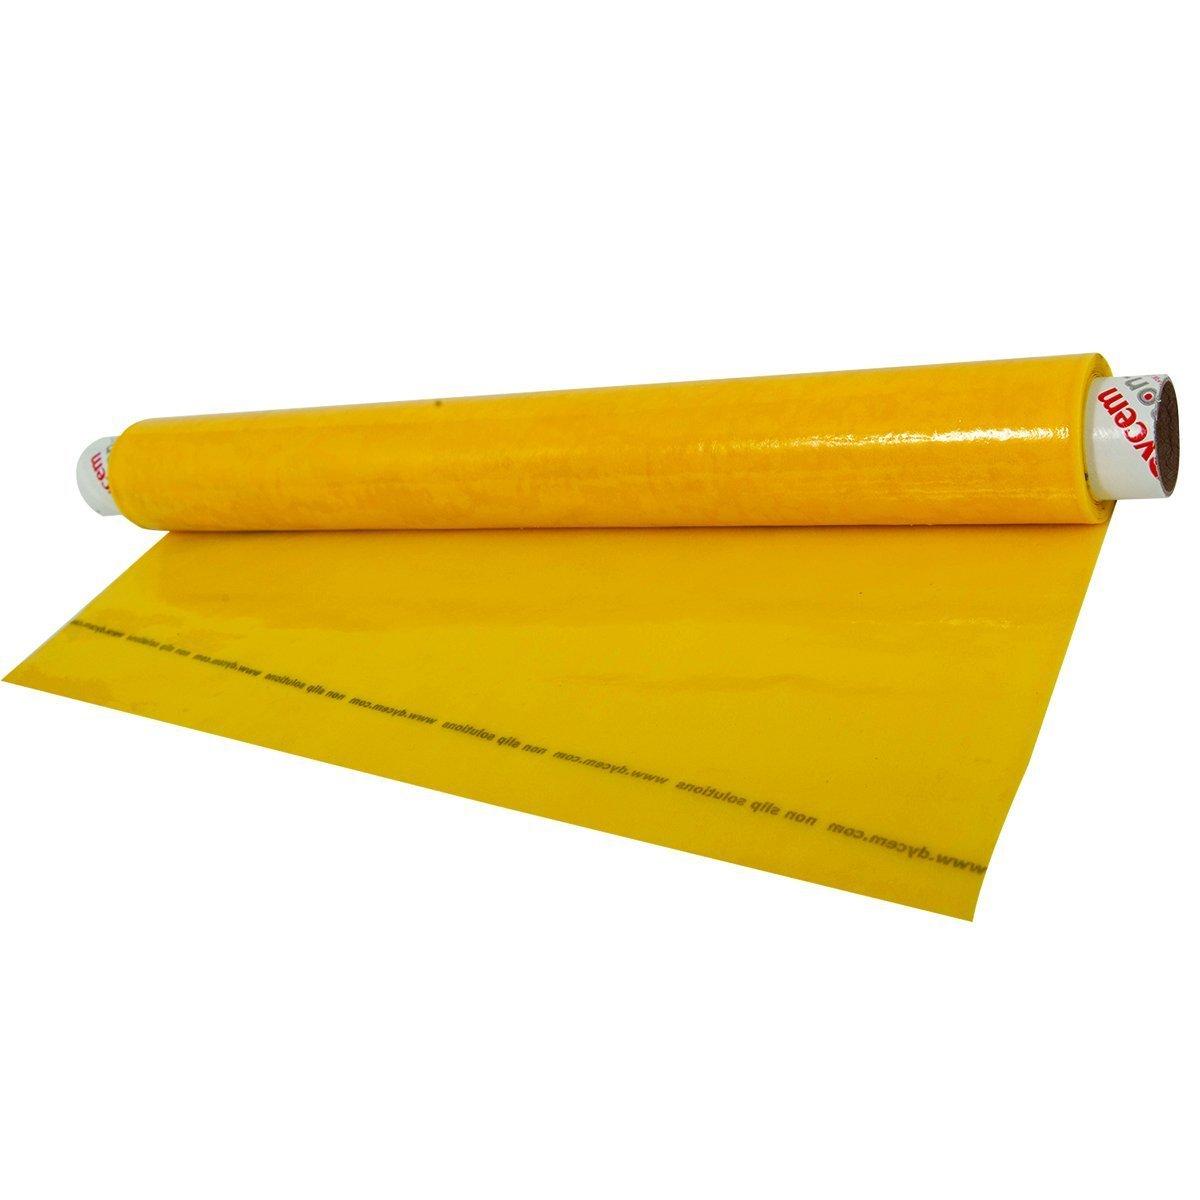 Dycem Non-slip Material, Roll 16''x1 Yard, Yellow Model NS03/L1/8